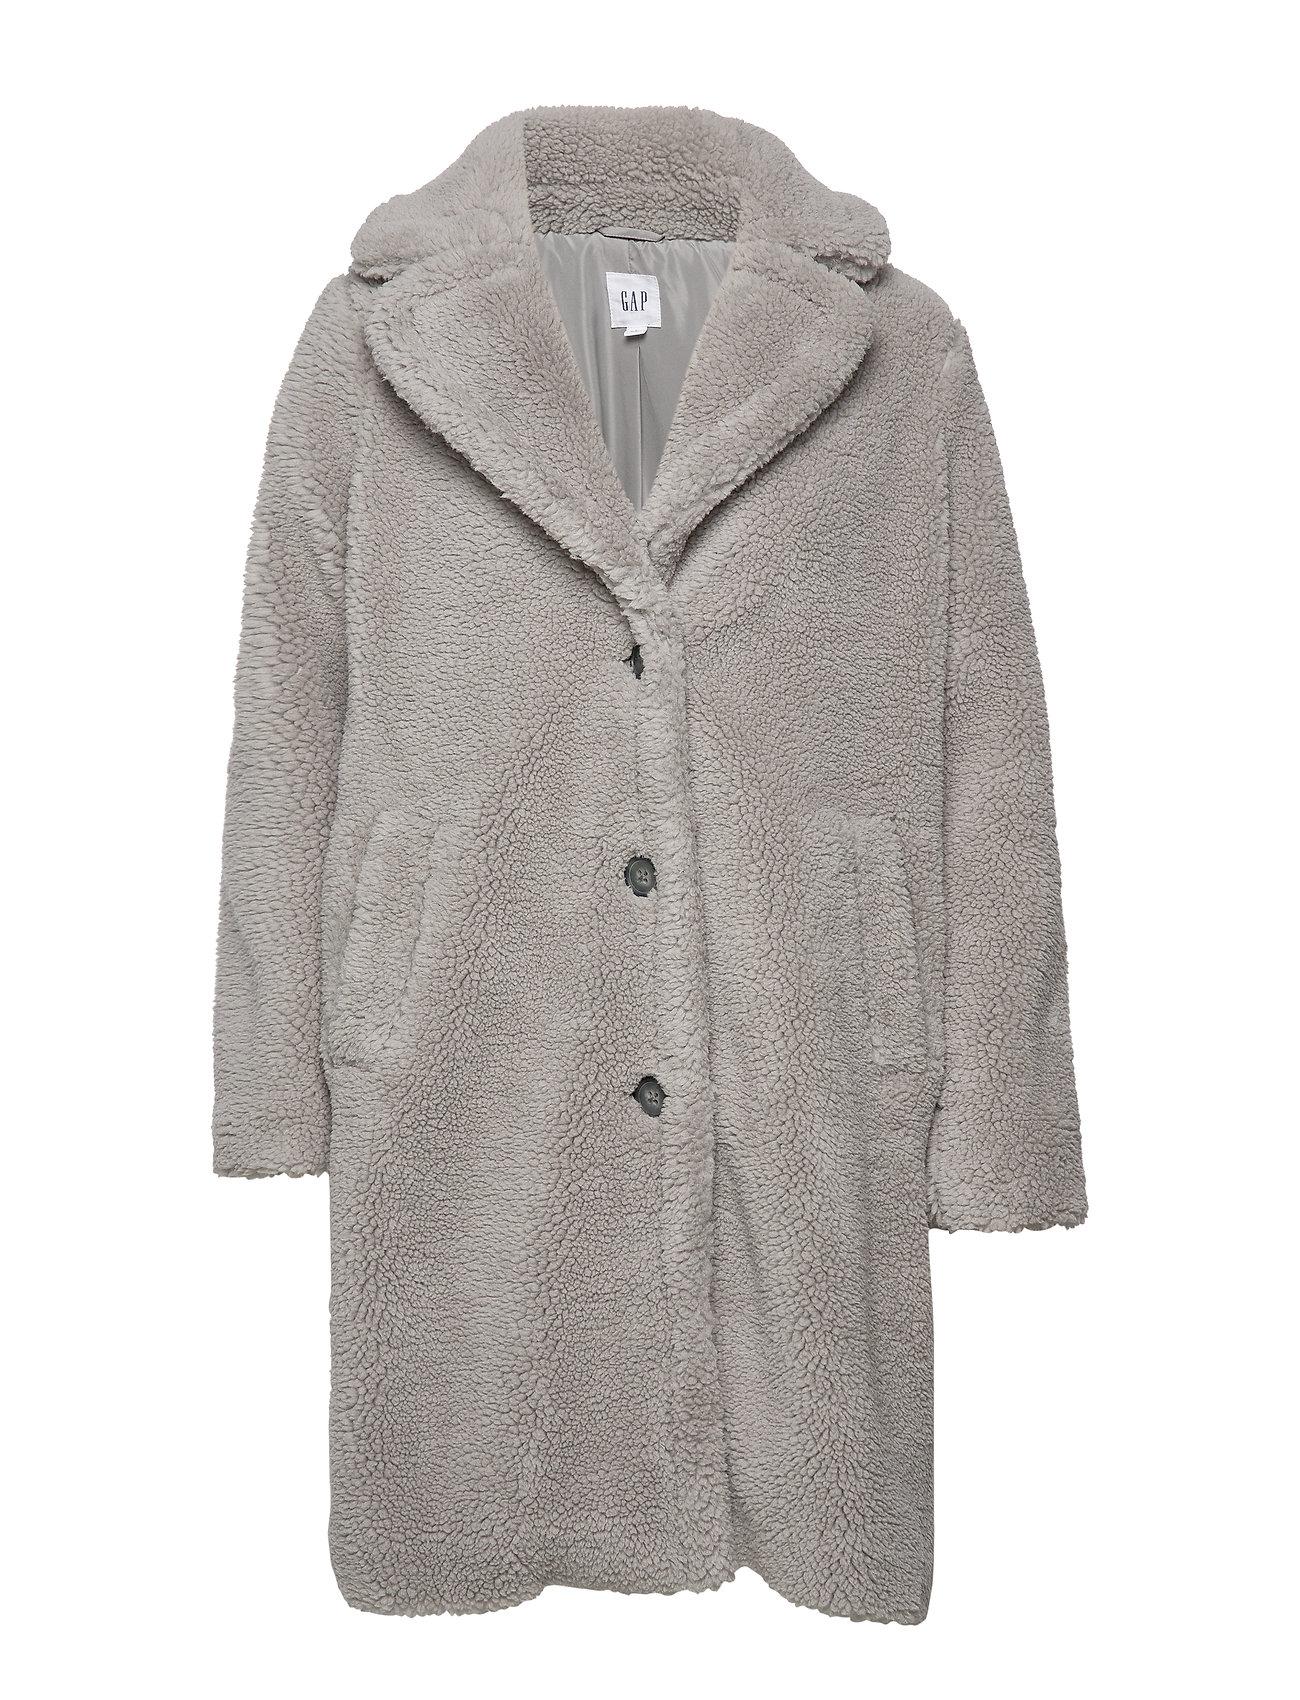 GAP Teddy Coat - SILVER GREY